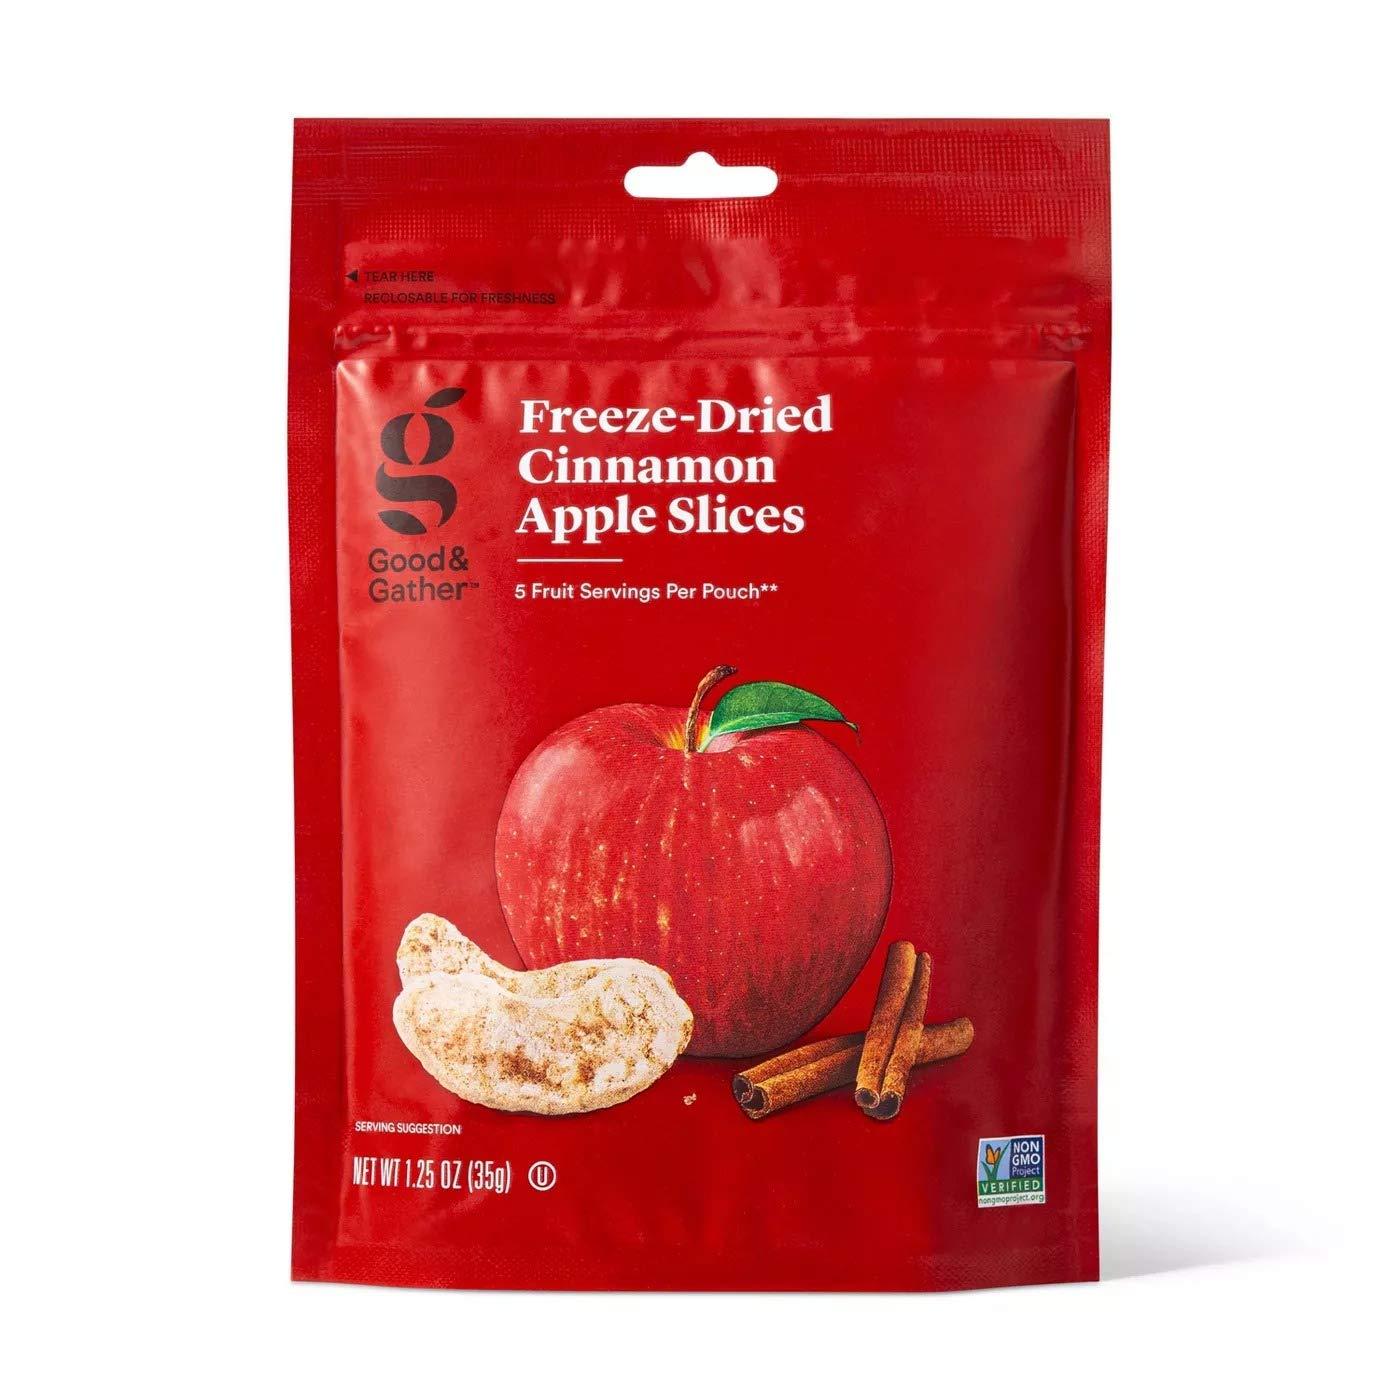 Good & Gather- Freeze Dried Cinnamon Apple Slices - 1.25oz